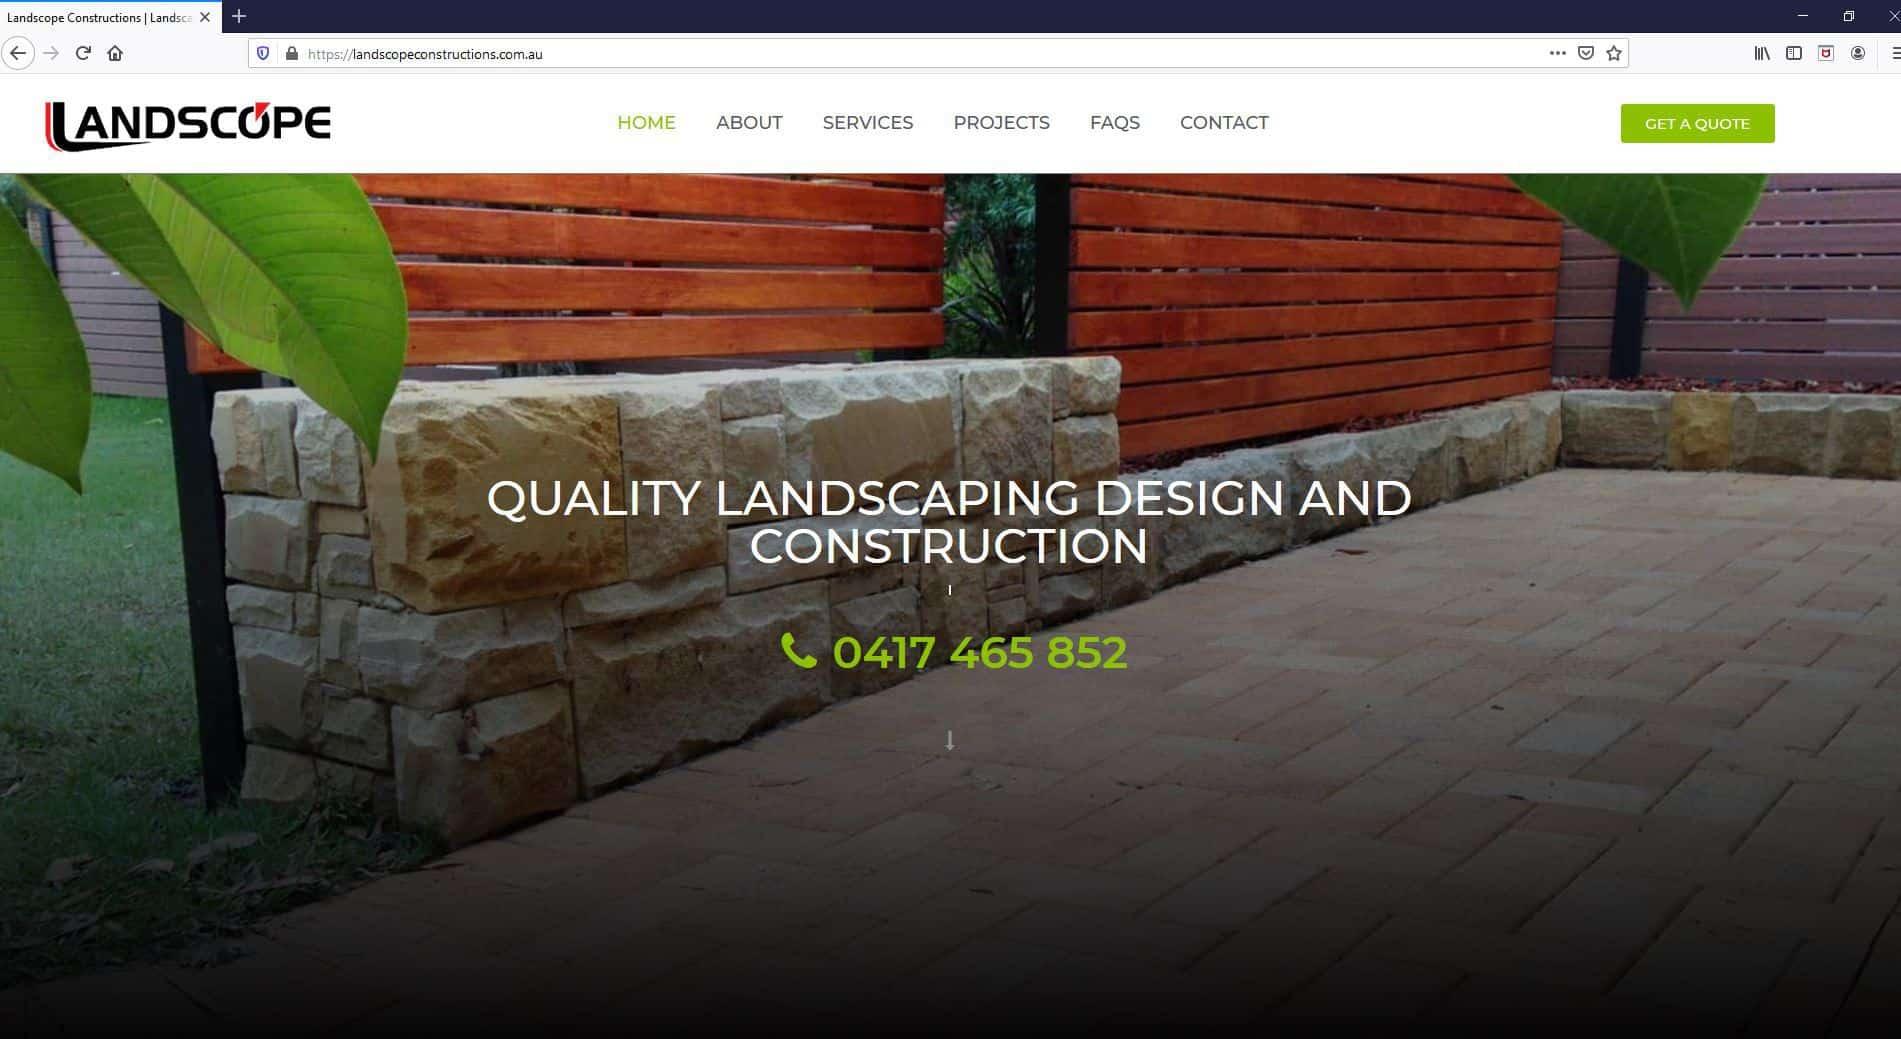 Landscope Constructions Website Screenshot